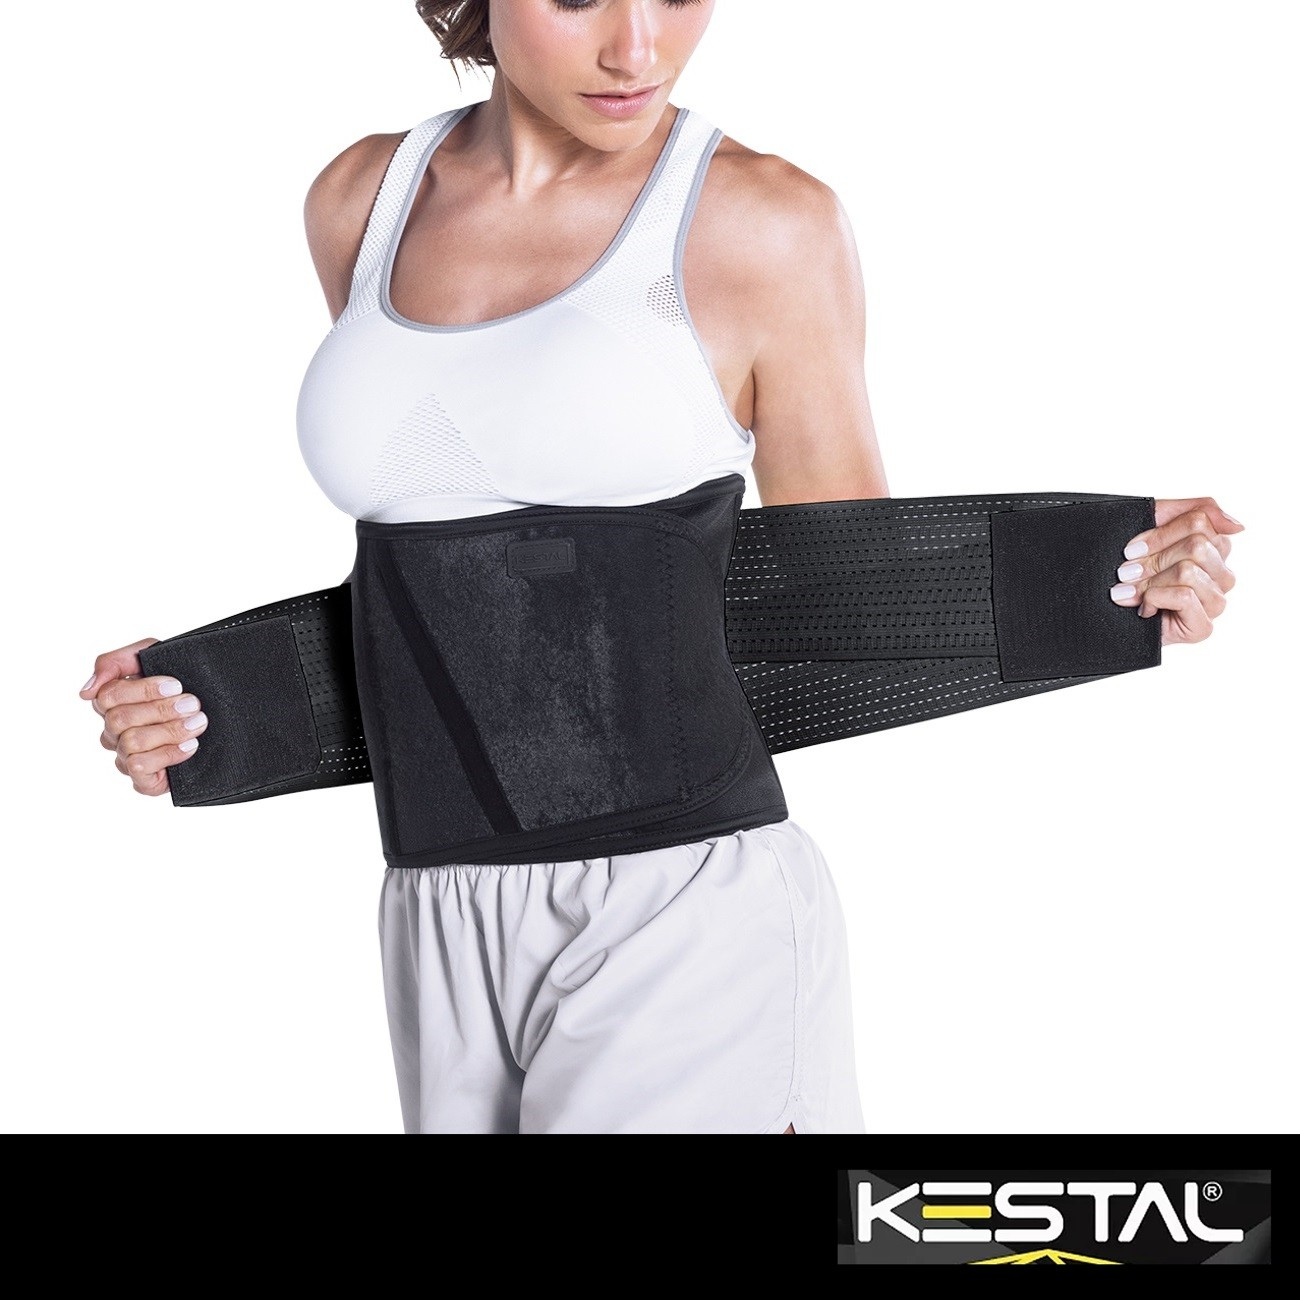 Cinta Modeladora Ajustável Preta (KSN062) - Kestal